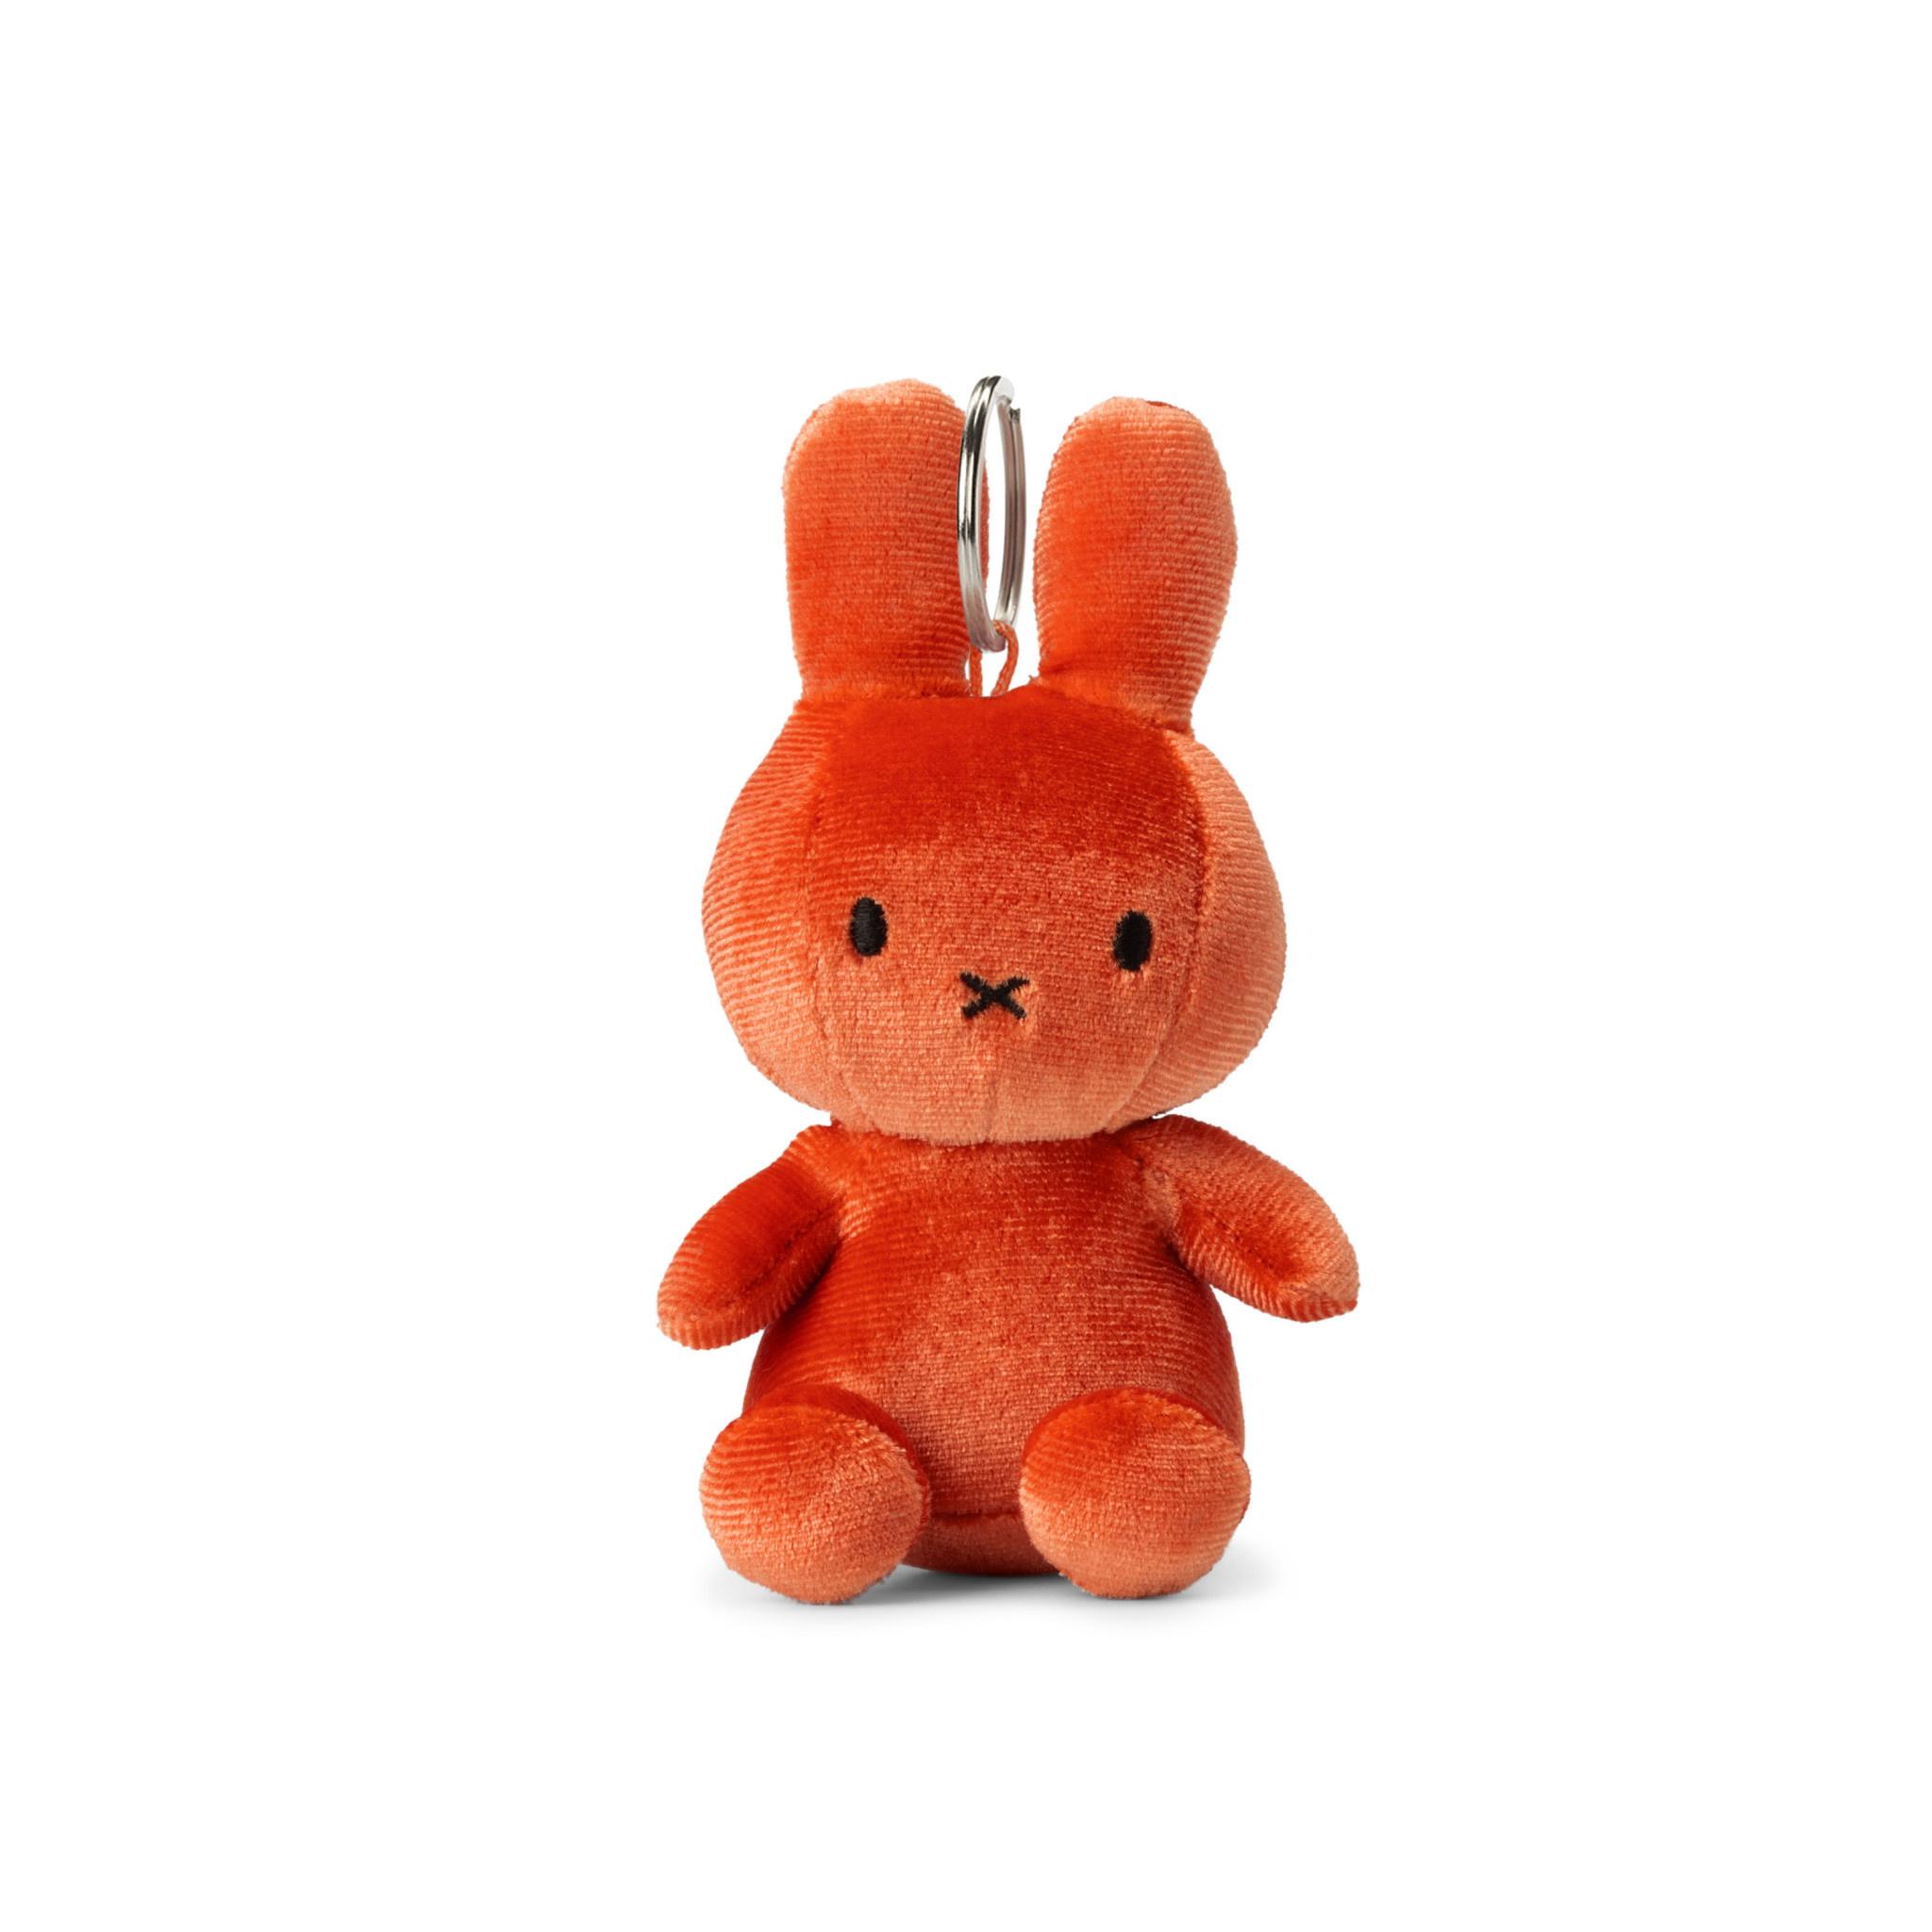 Nijntje/Miffy/Snuffy Miffy Keychain Velvet Orange - 10 cm